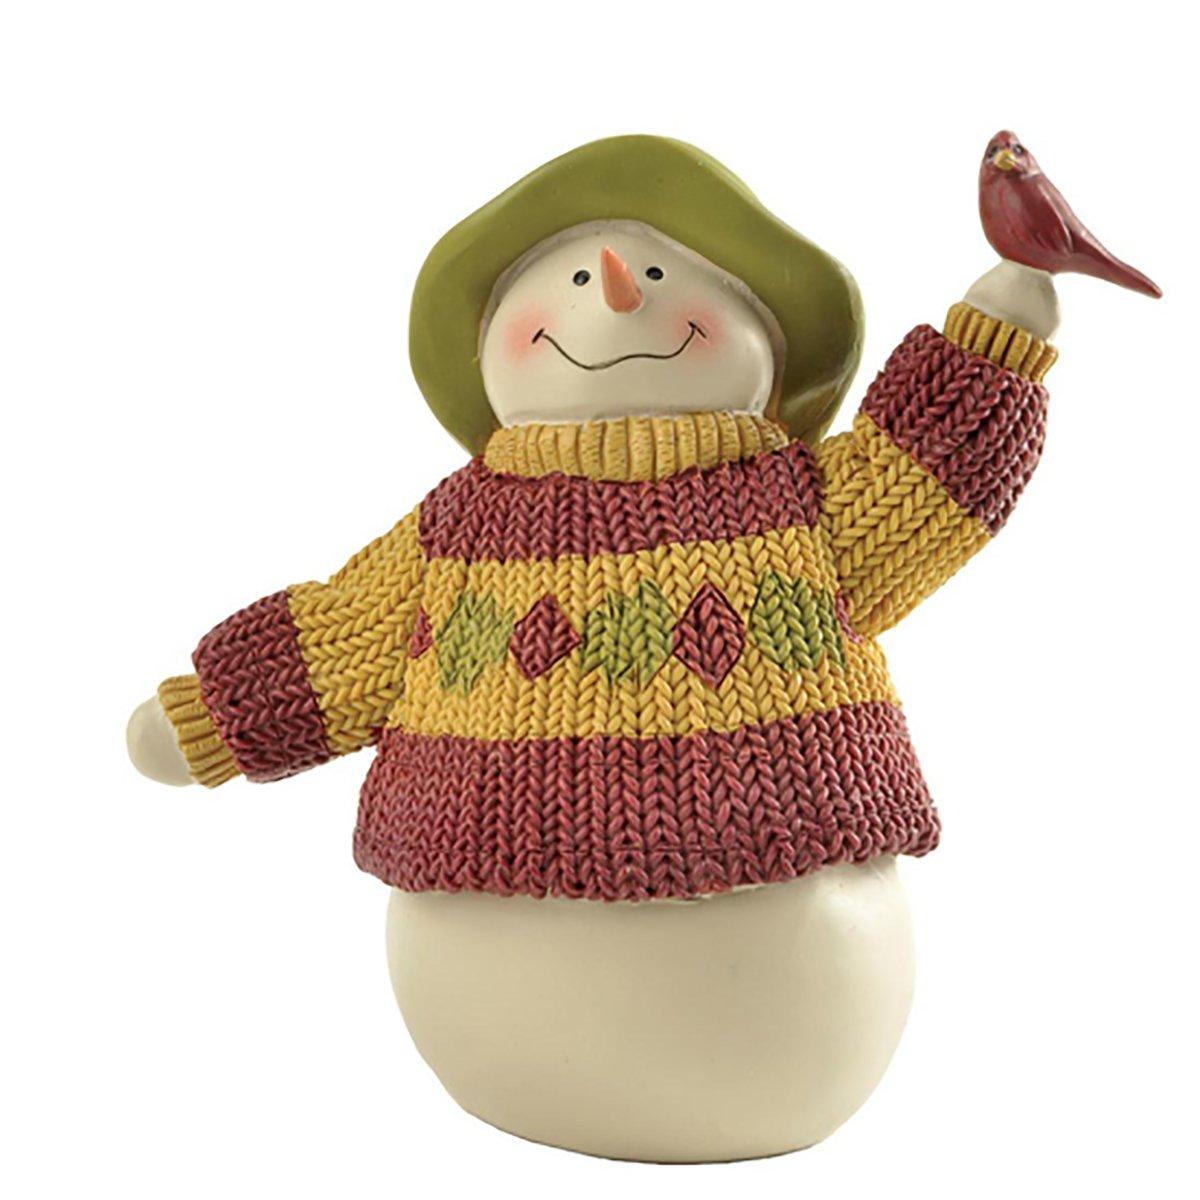 "ENNAS 4.13"" Tall Snowman with Cardinals Bird Figurines Collectibles Home Decor"